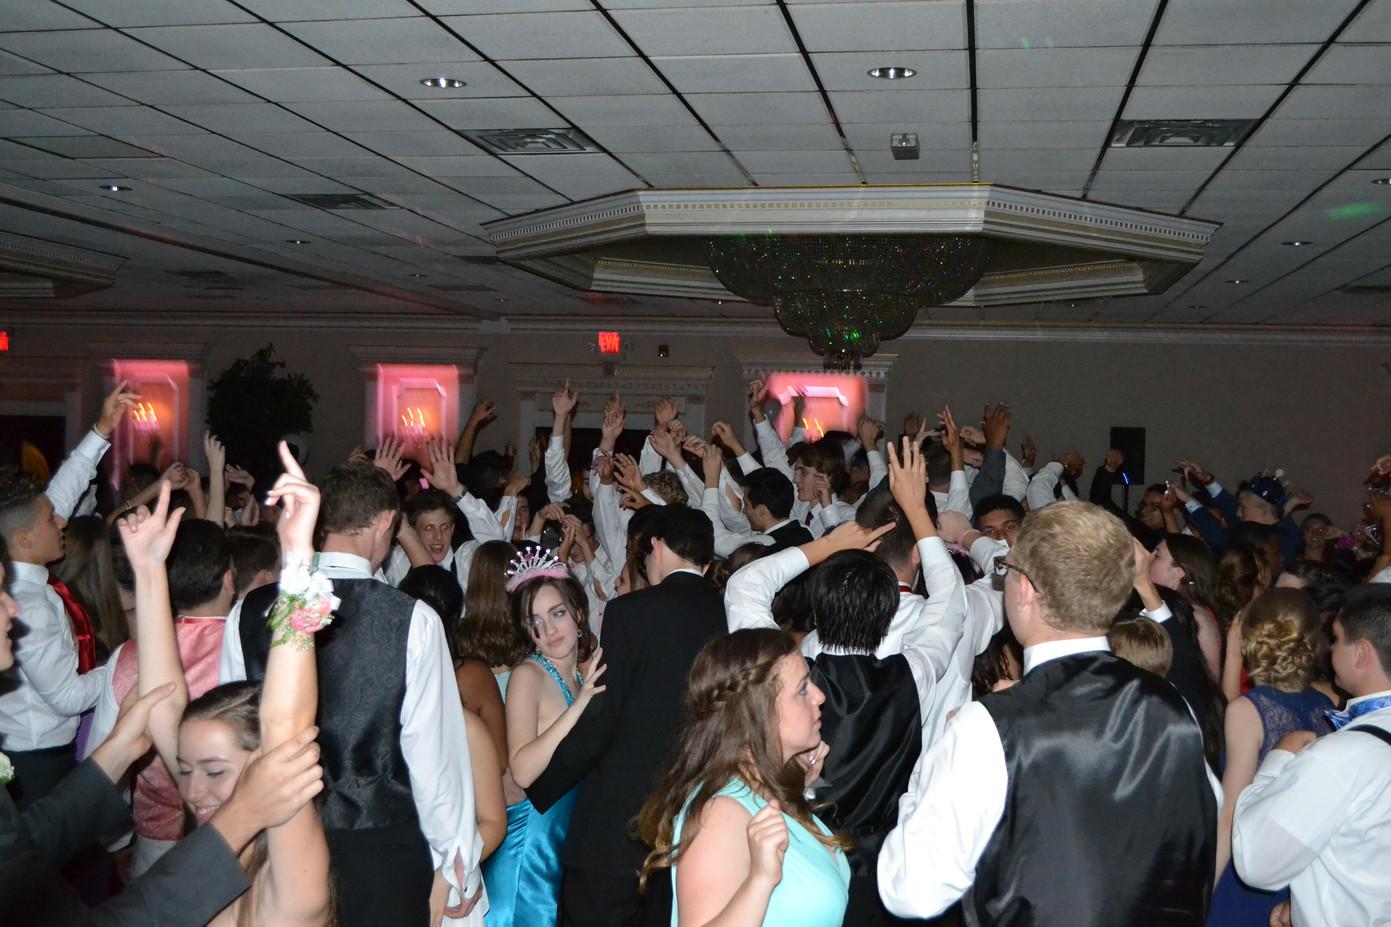 High-School-Group-Prom-Dance.JPG